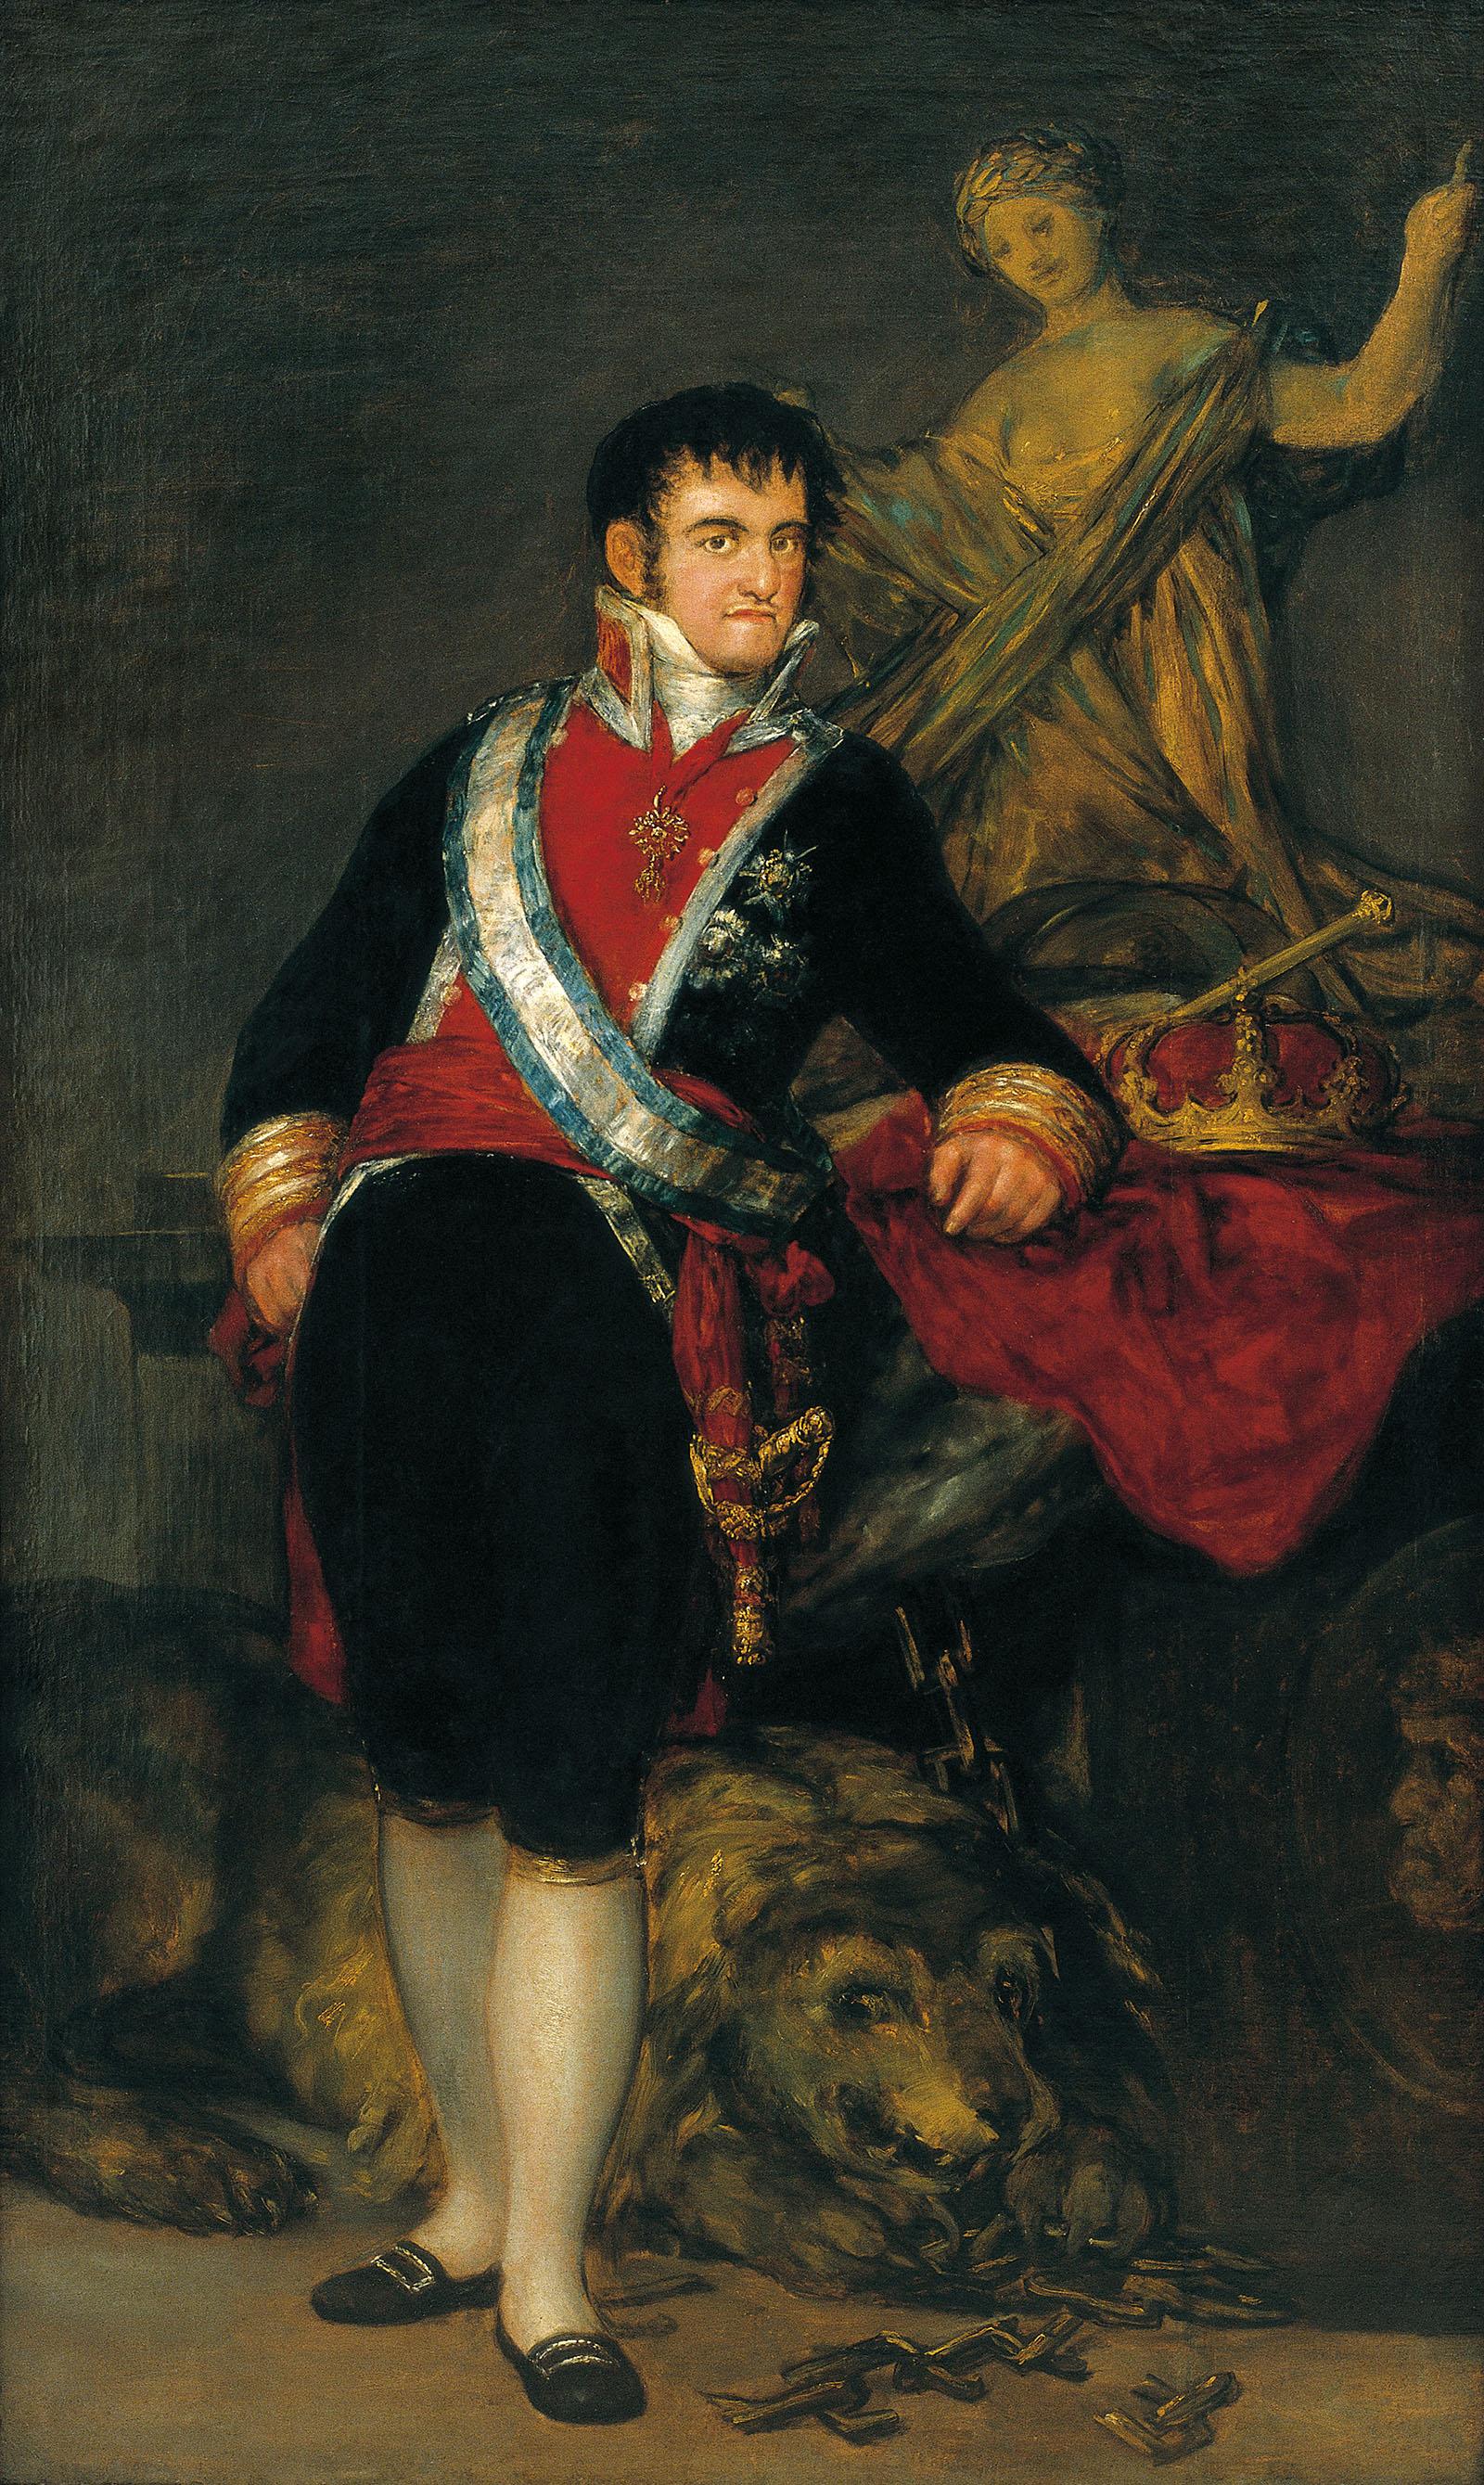 Fernando VII realizado por Francisco de Goya en 1814.